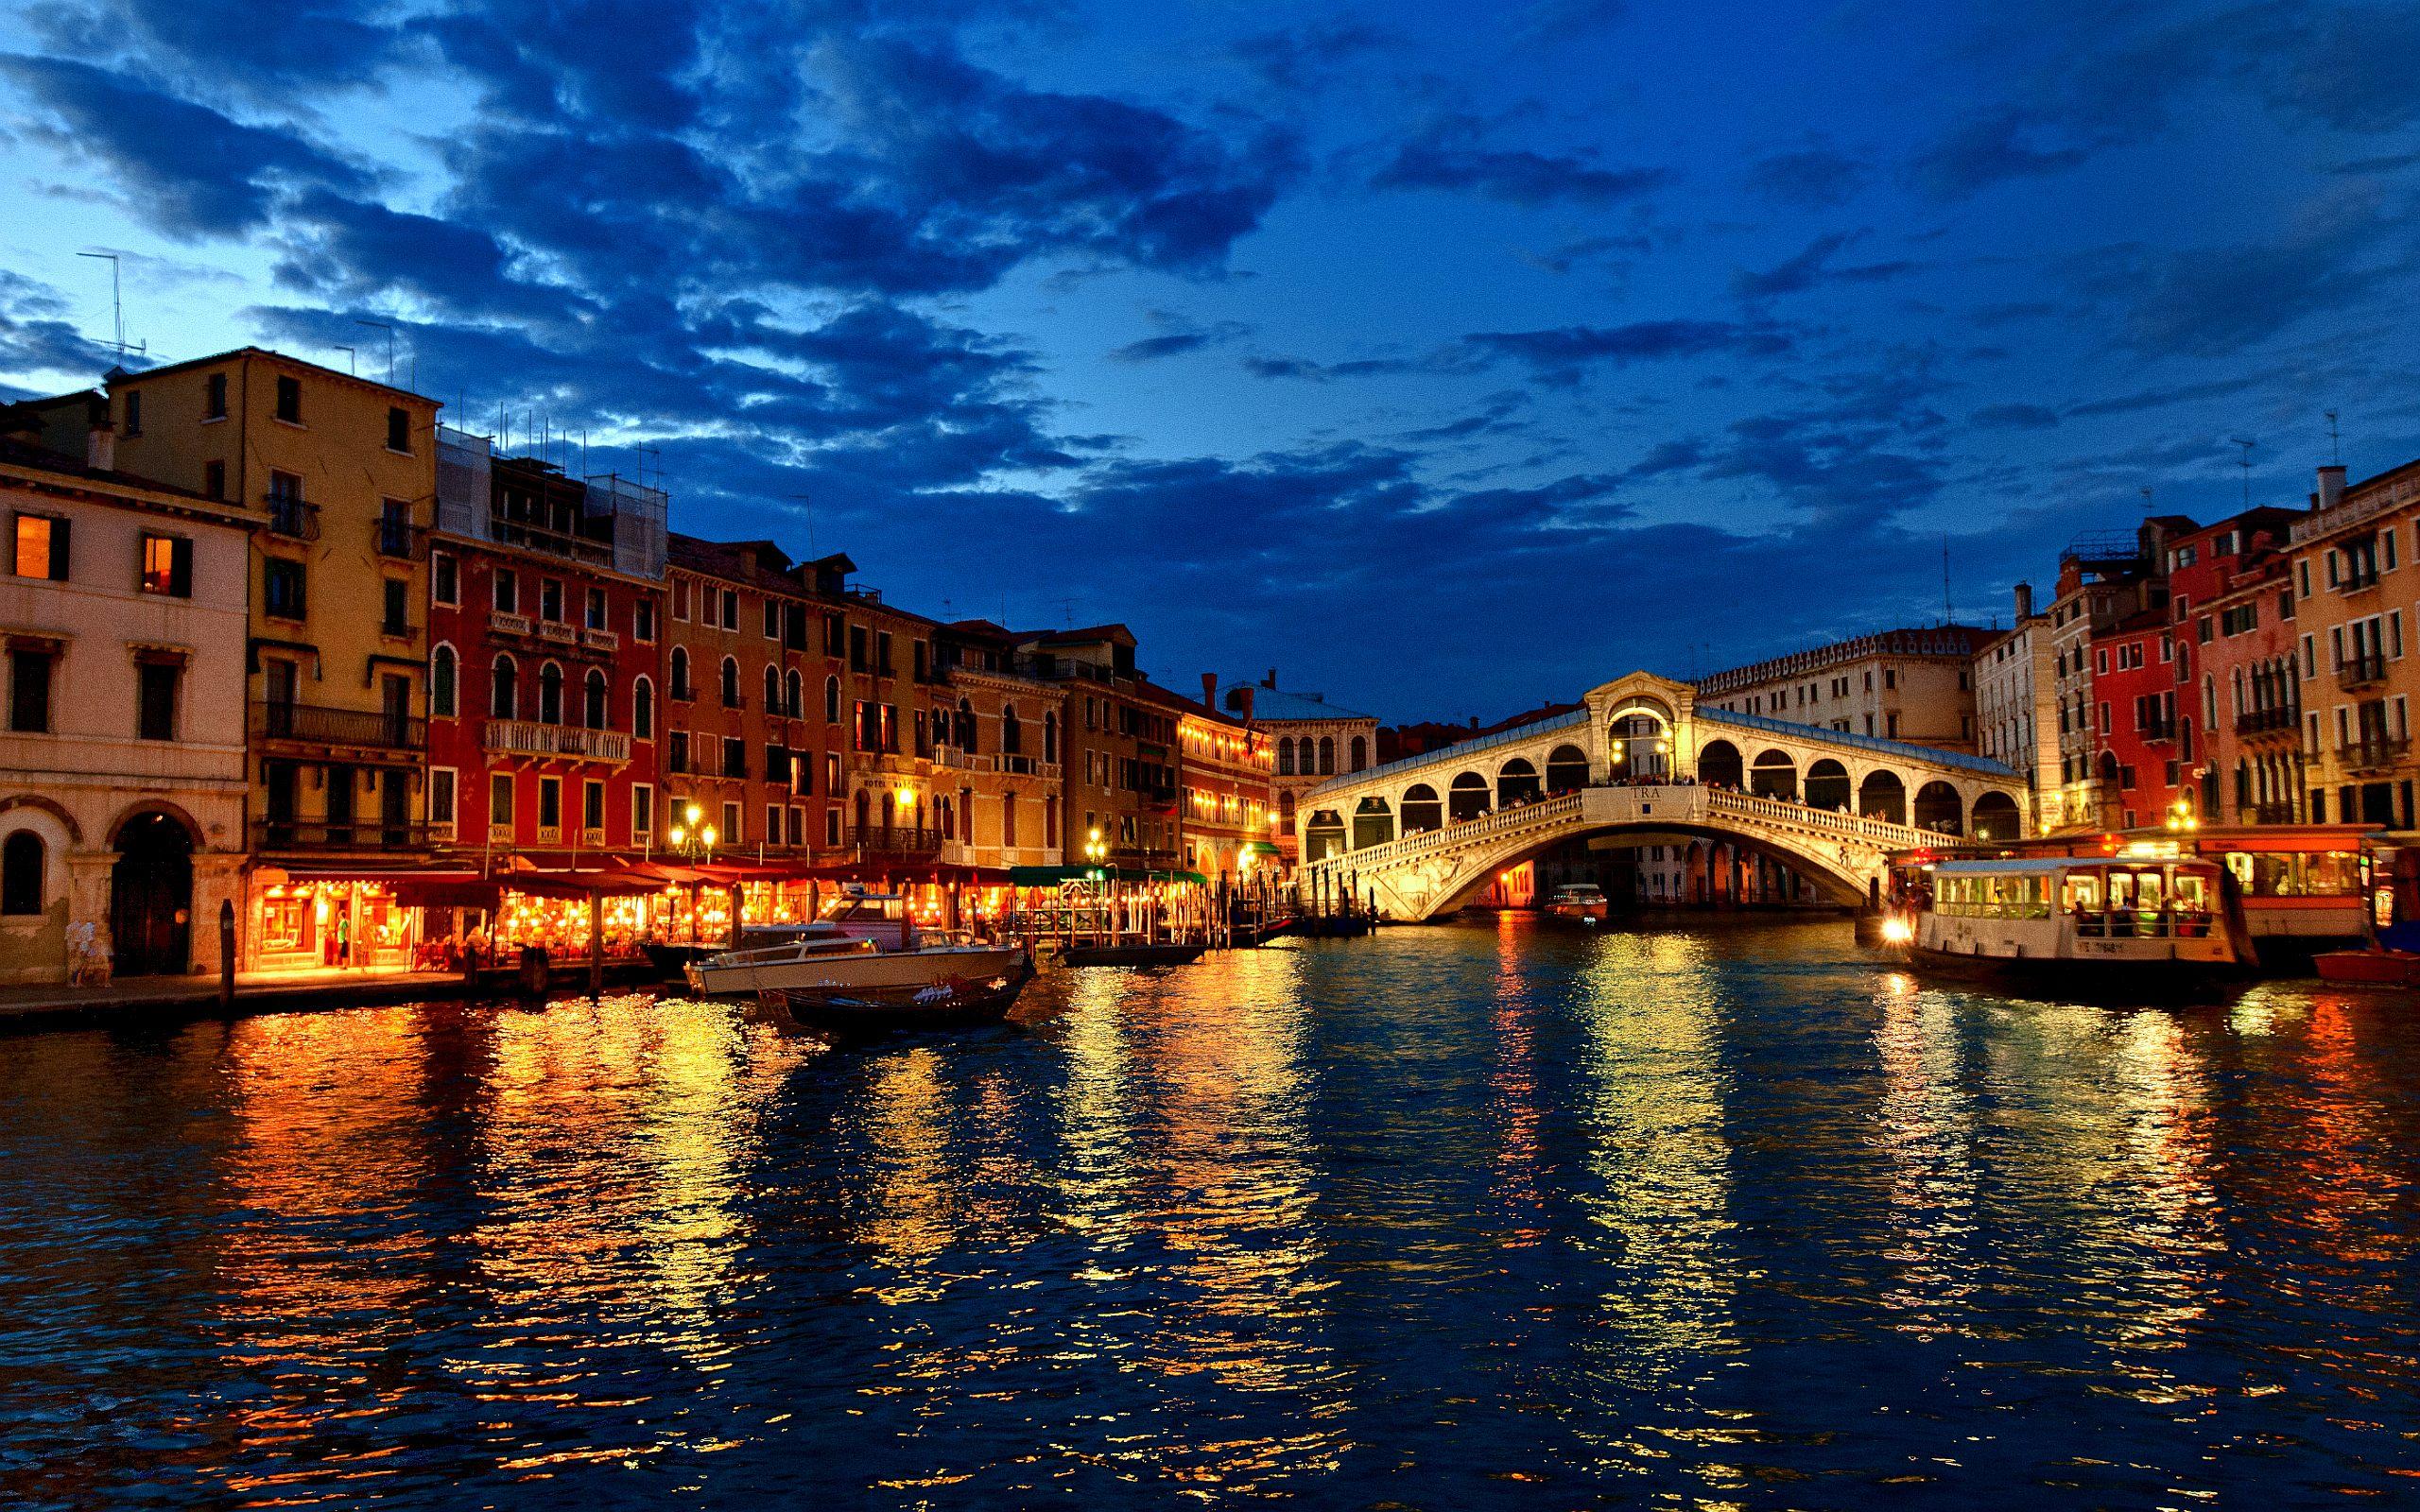 Venice at Night wallpaper 2560x1600 22079 2560x1600